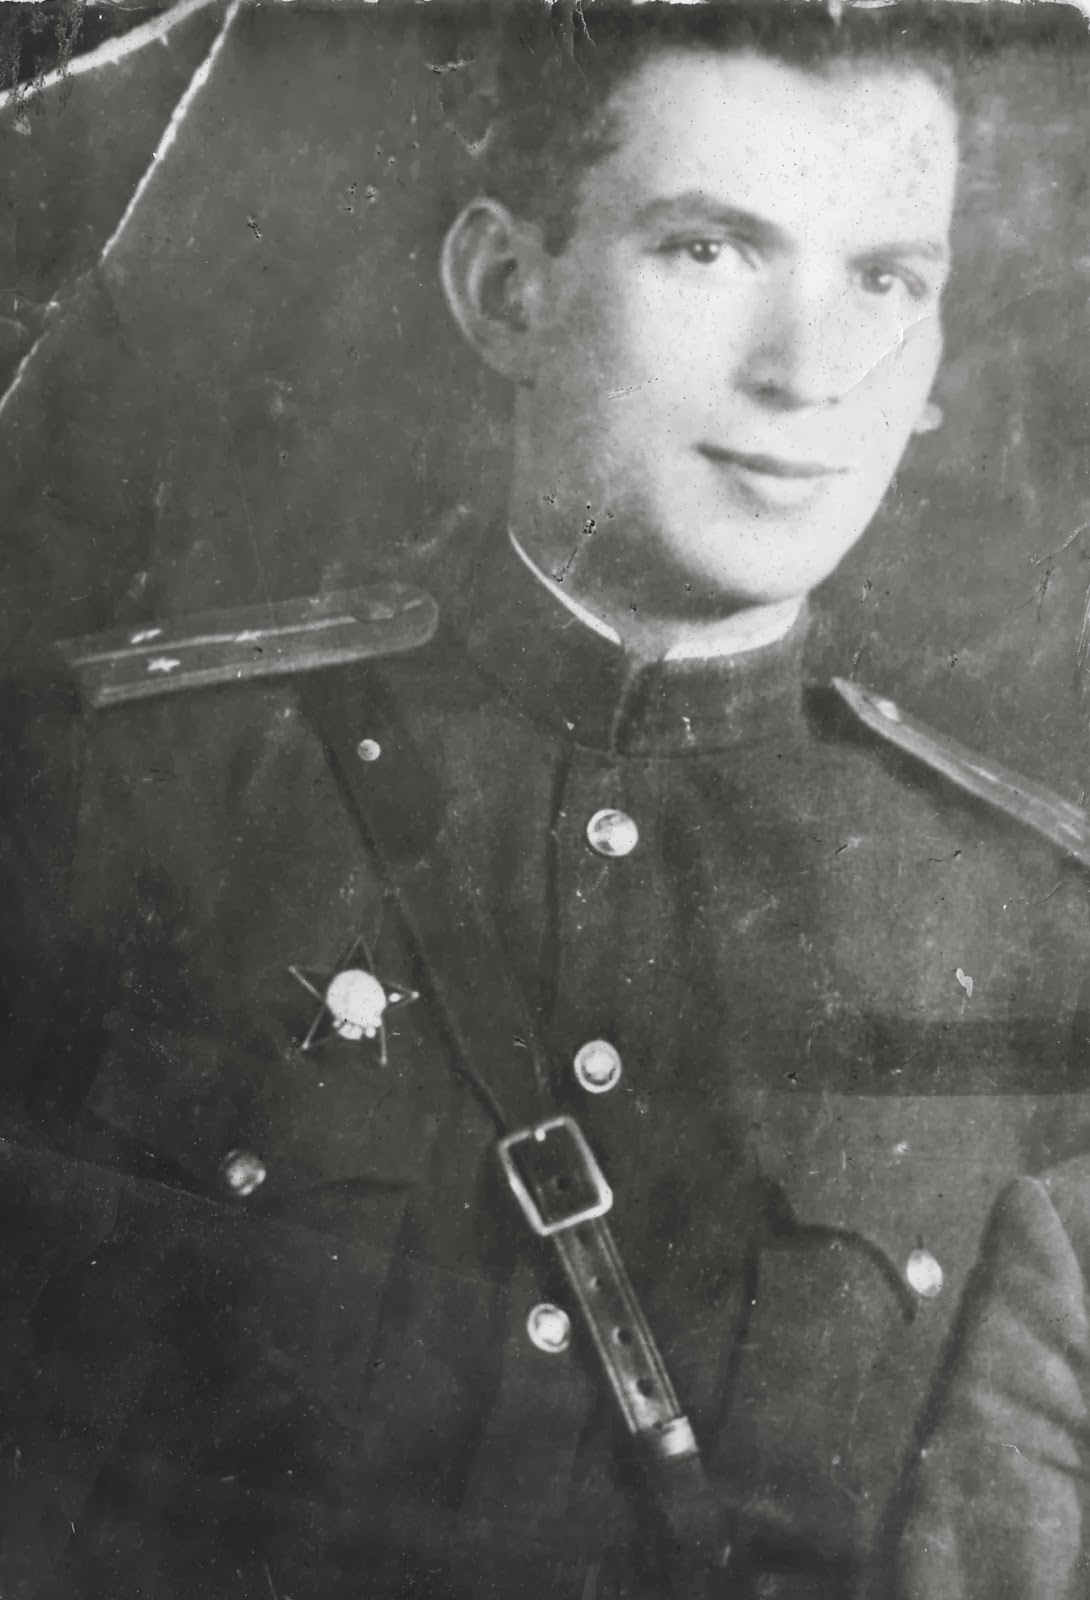 Abdula Dudievič Tsaroev